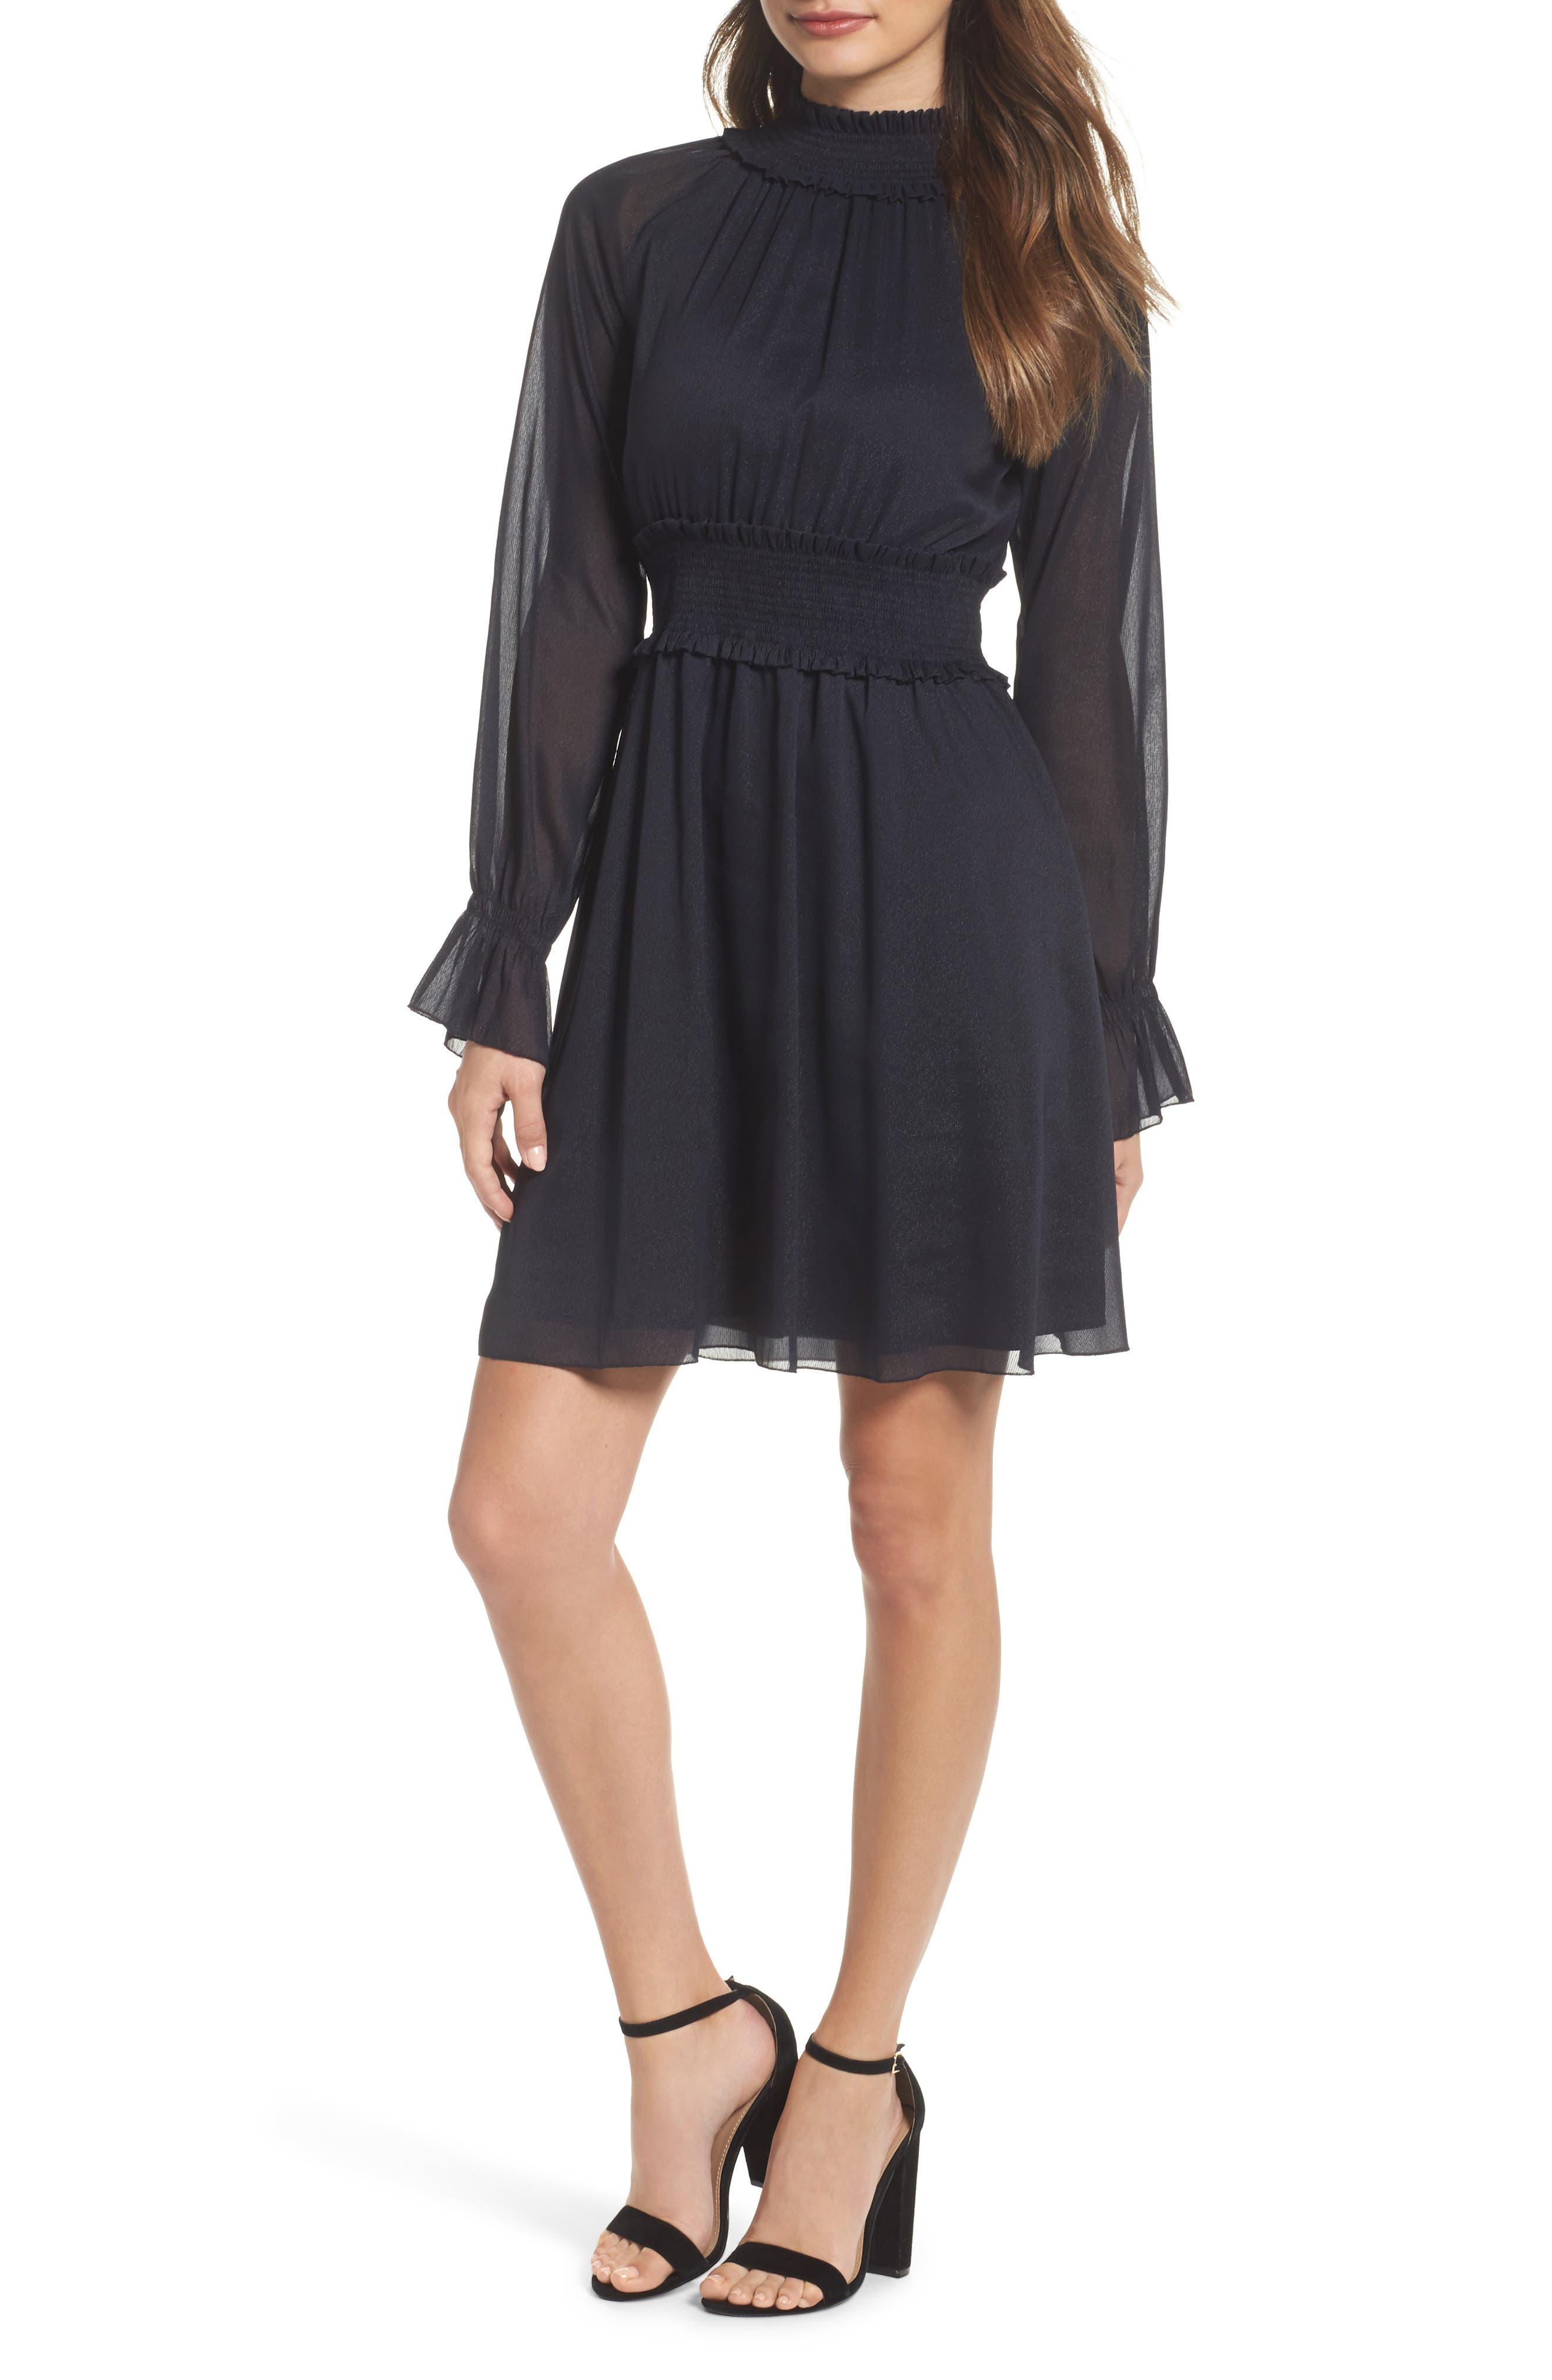 Alternate Image 1 Selected - Chelsea28 Smocked Long Sleeve Dress